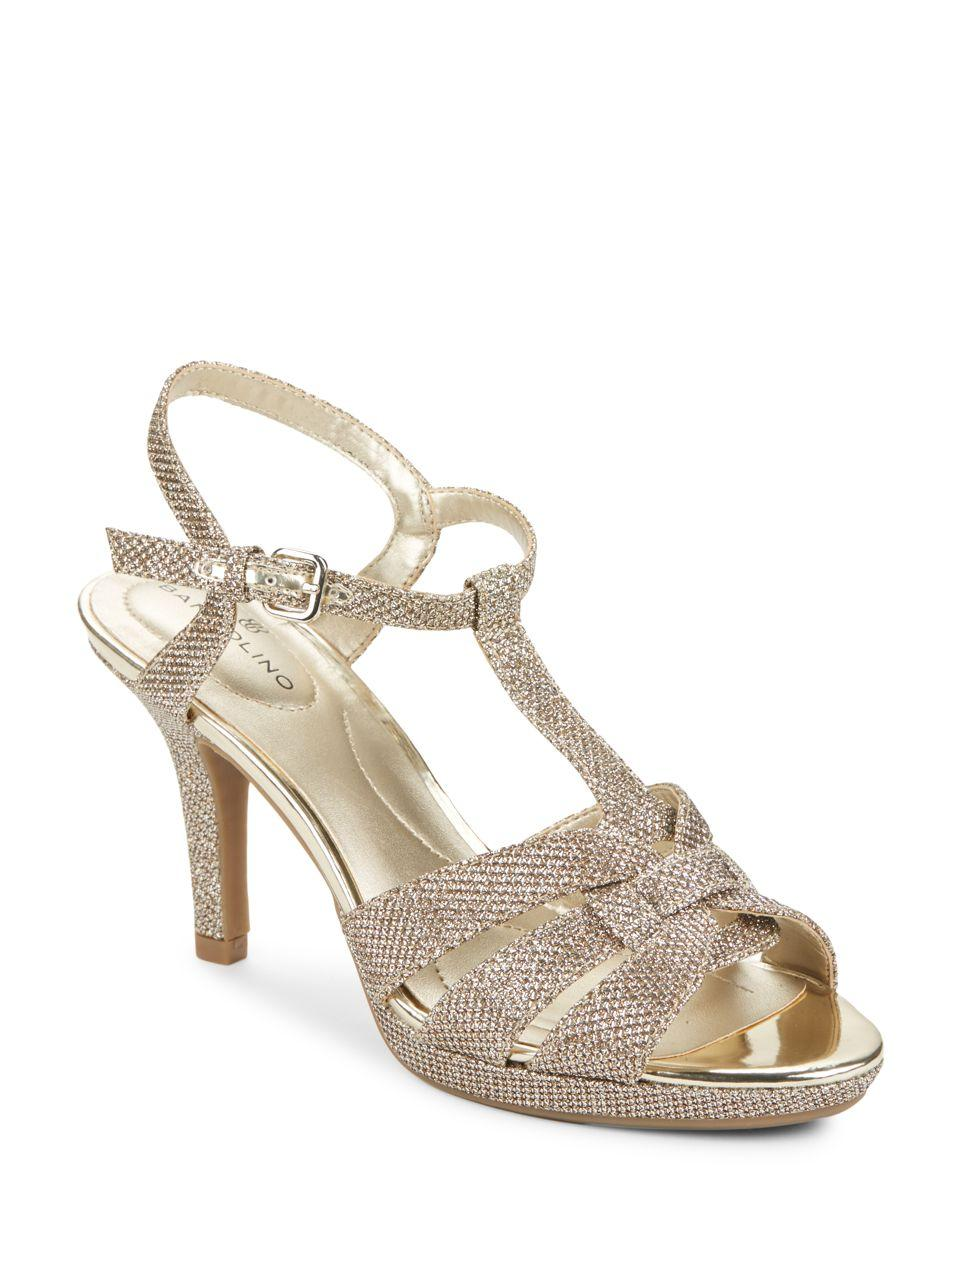 Lyst Bandolino Sahari Glitter Sandals In Metallic